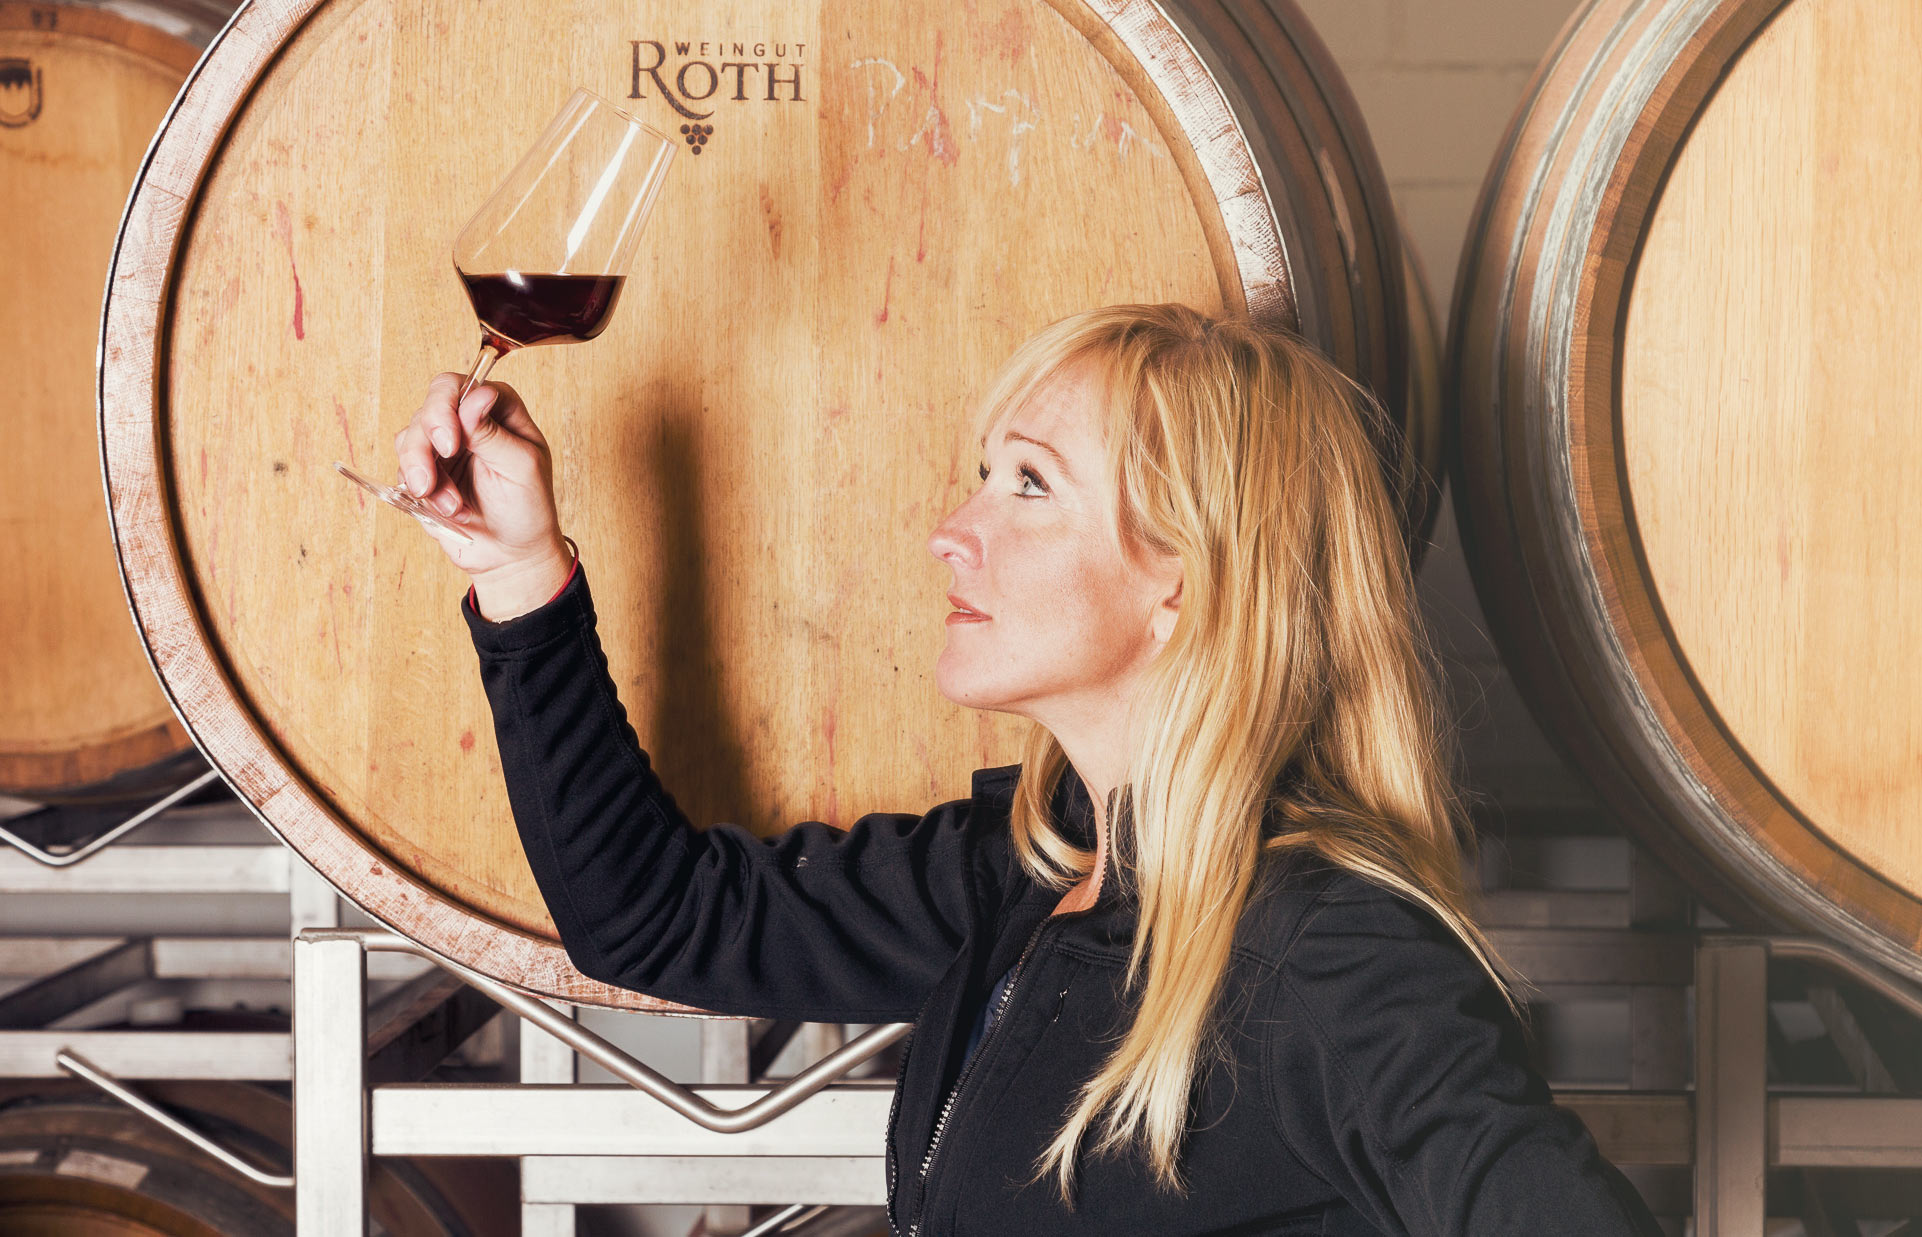 Nicole Roth – Weingut Roth, Franken